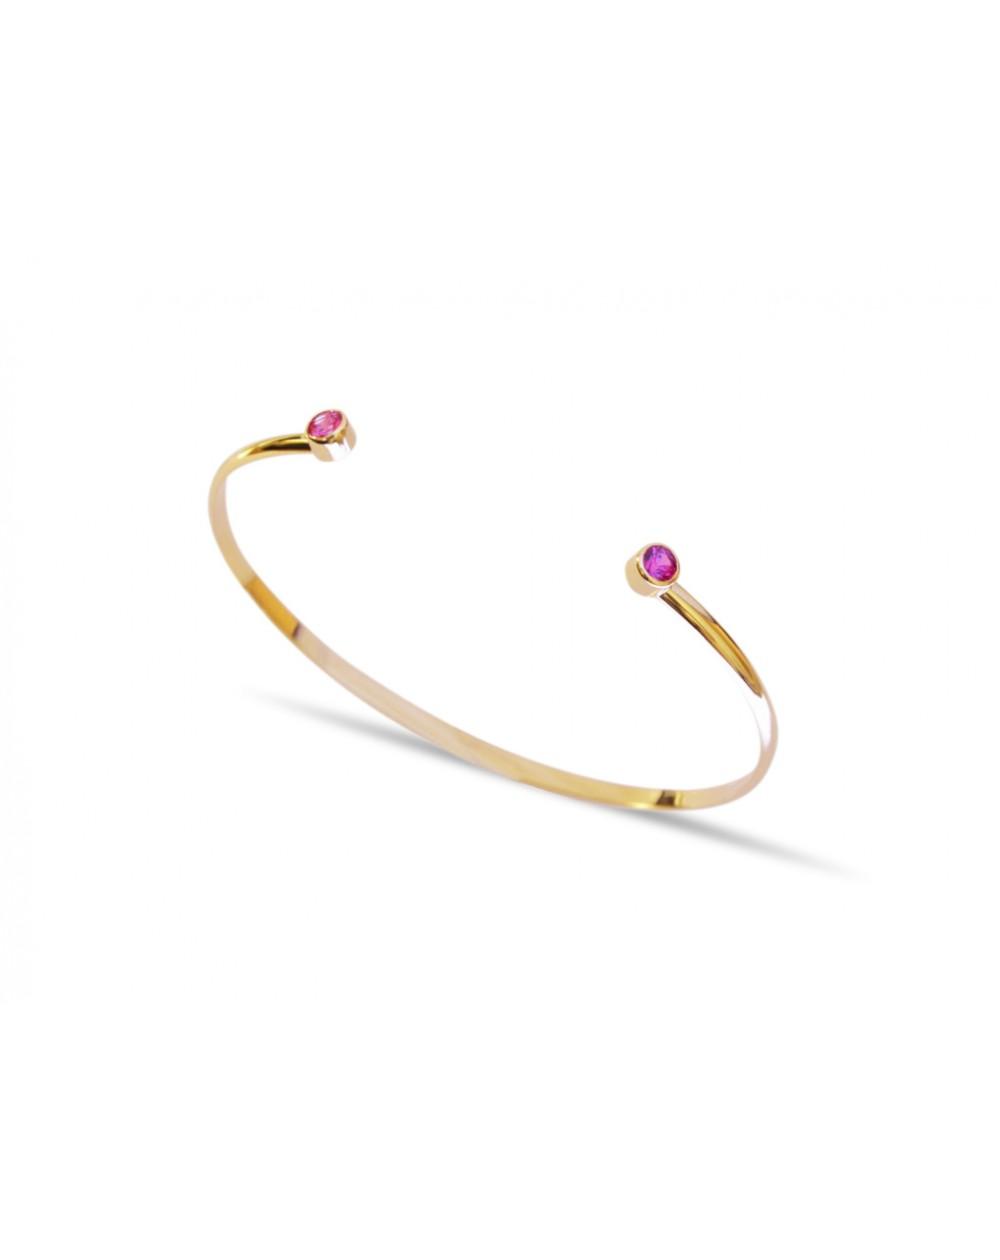 Bracelet Or jaune et Saphirs Roses